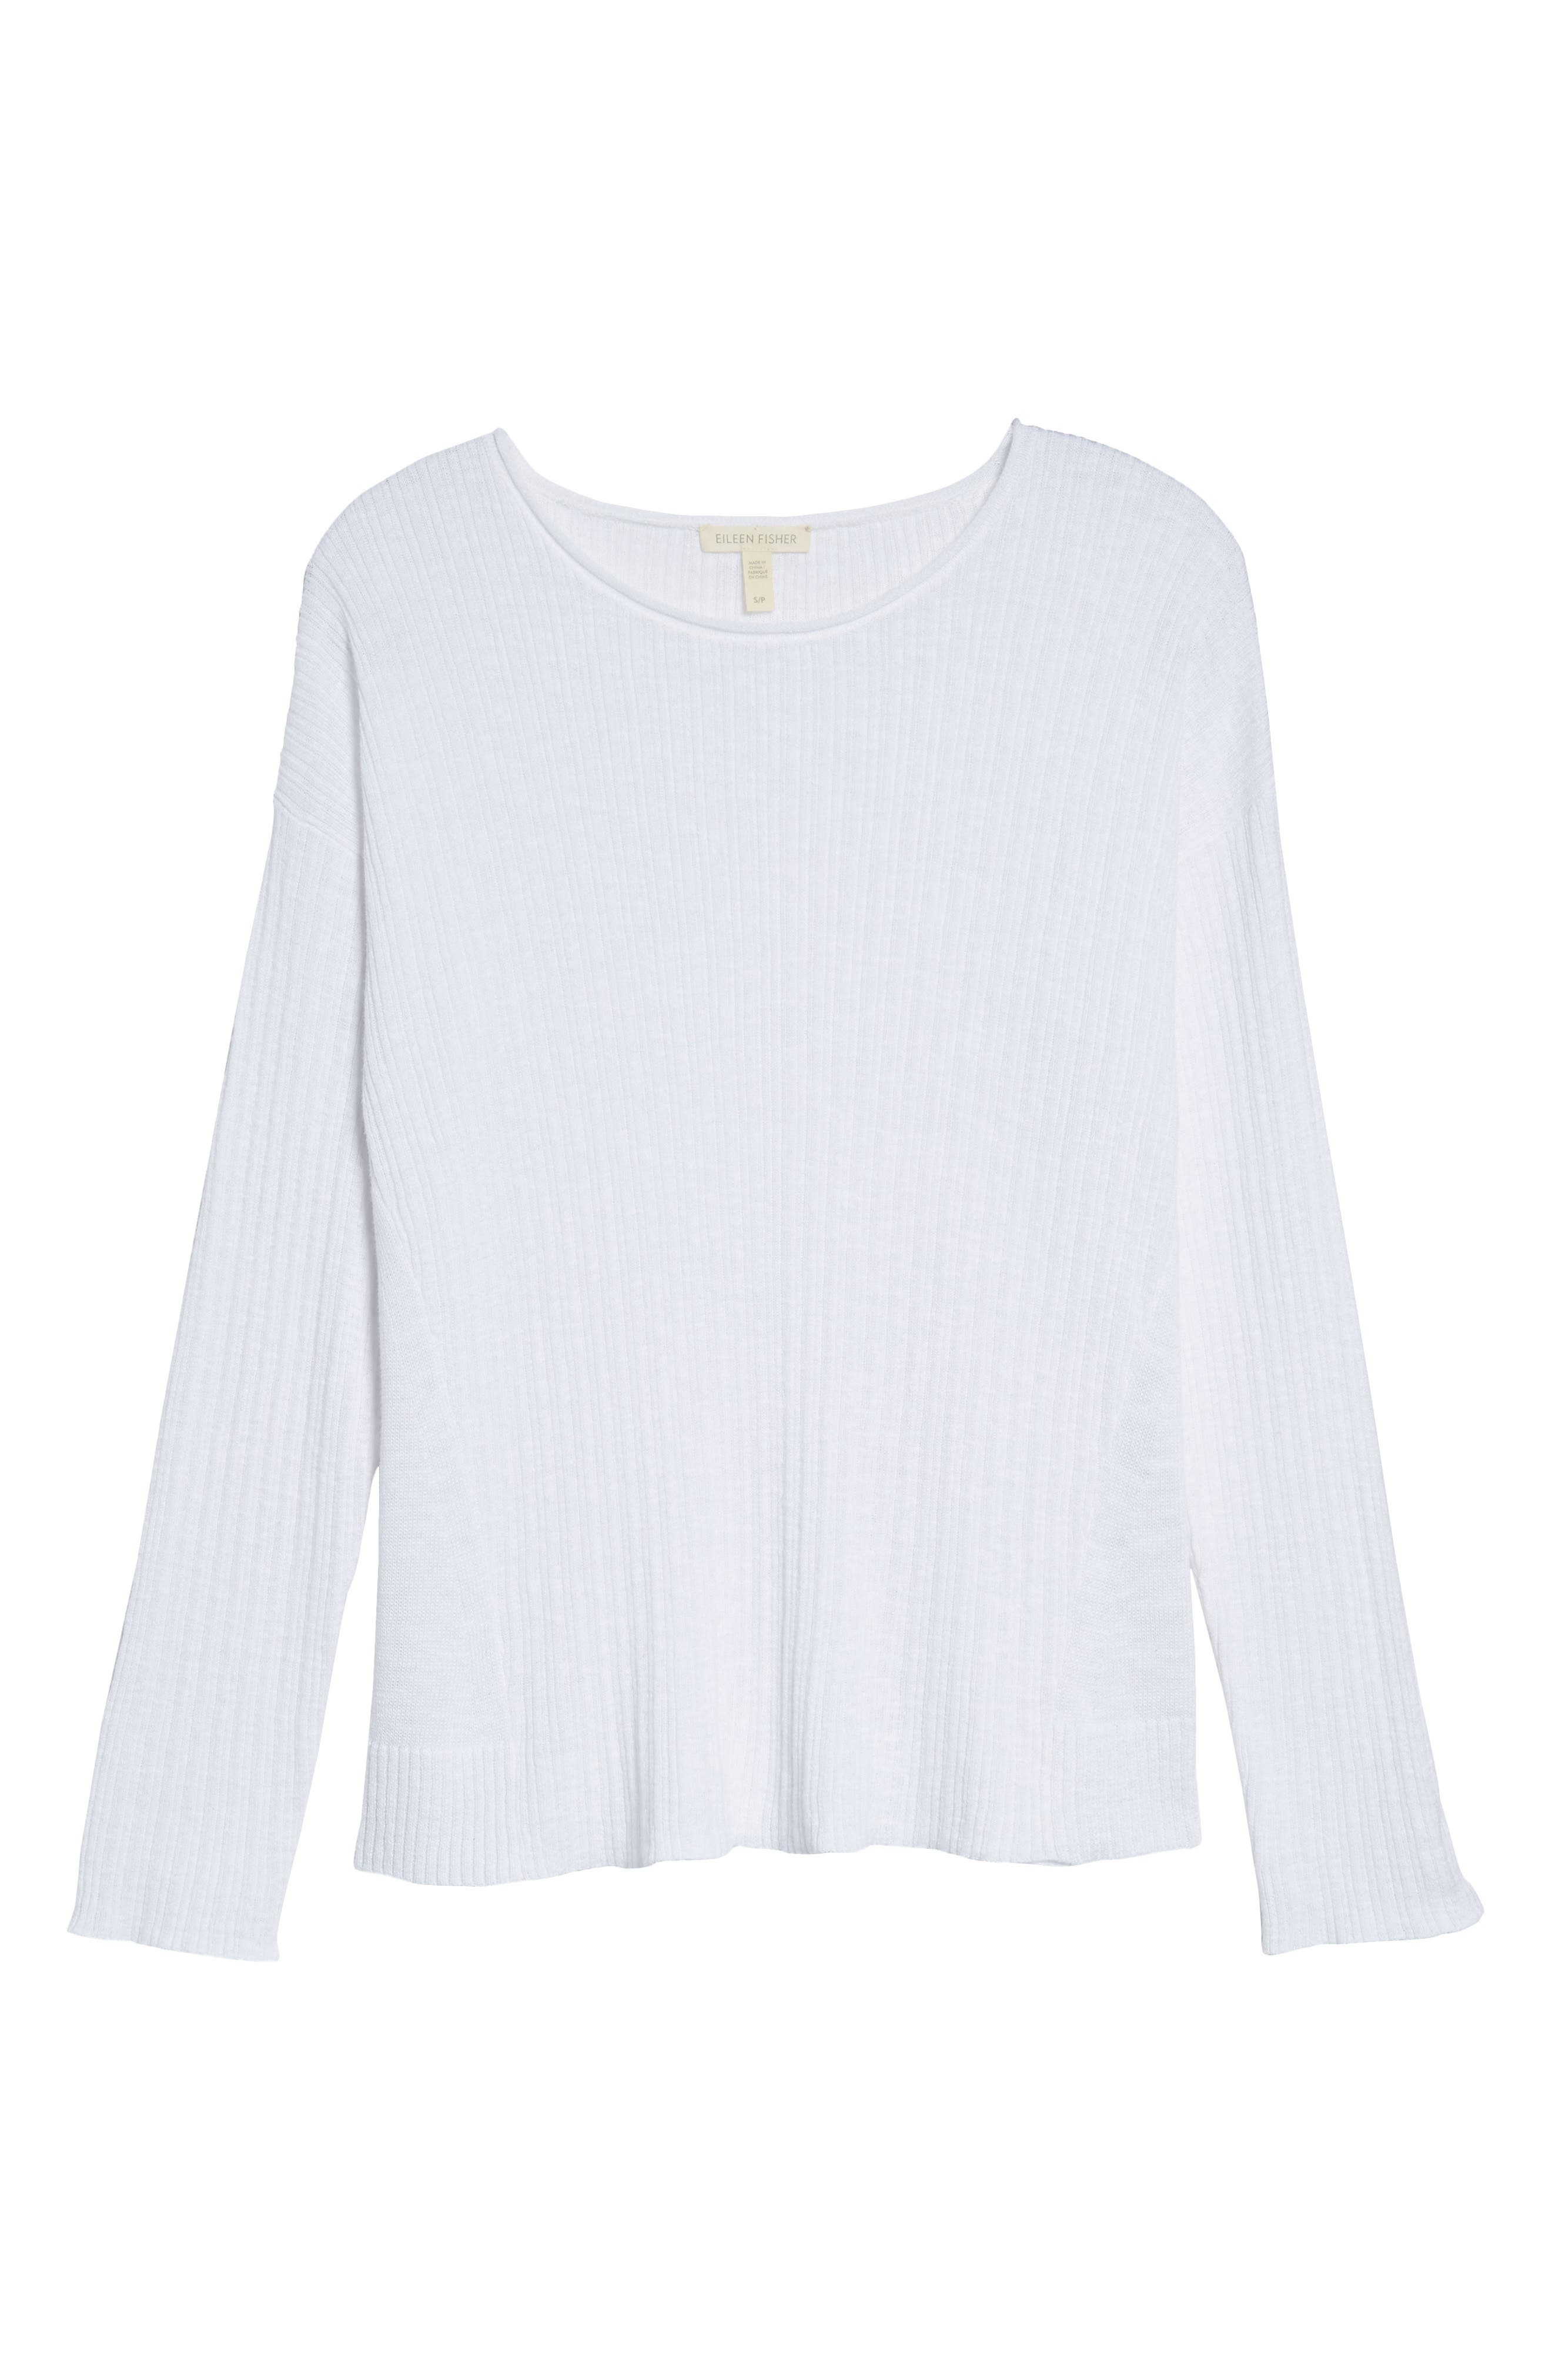 Organic Linen & Cotton Crewneck Sweater,                             Alternate thumbnail 26, color,